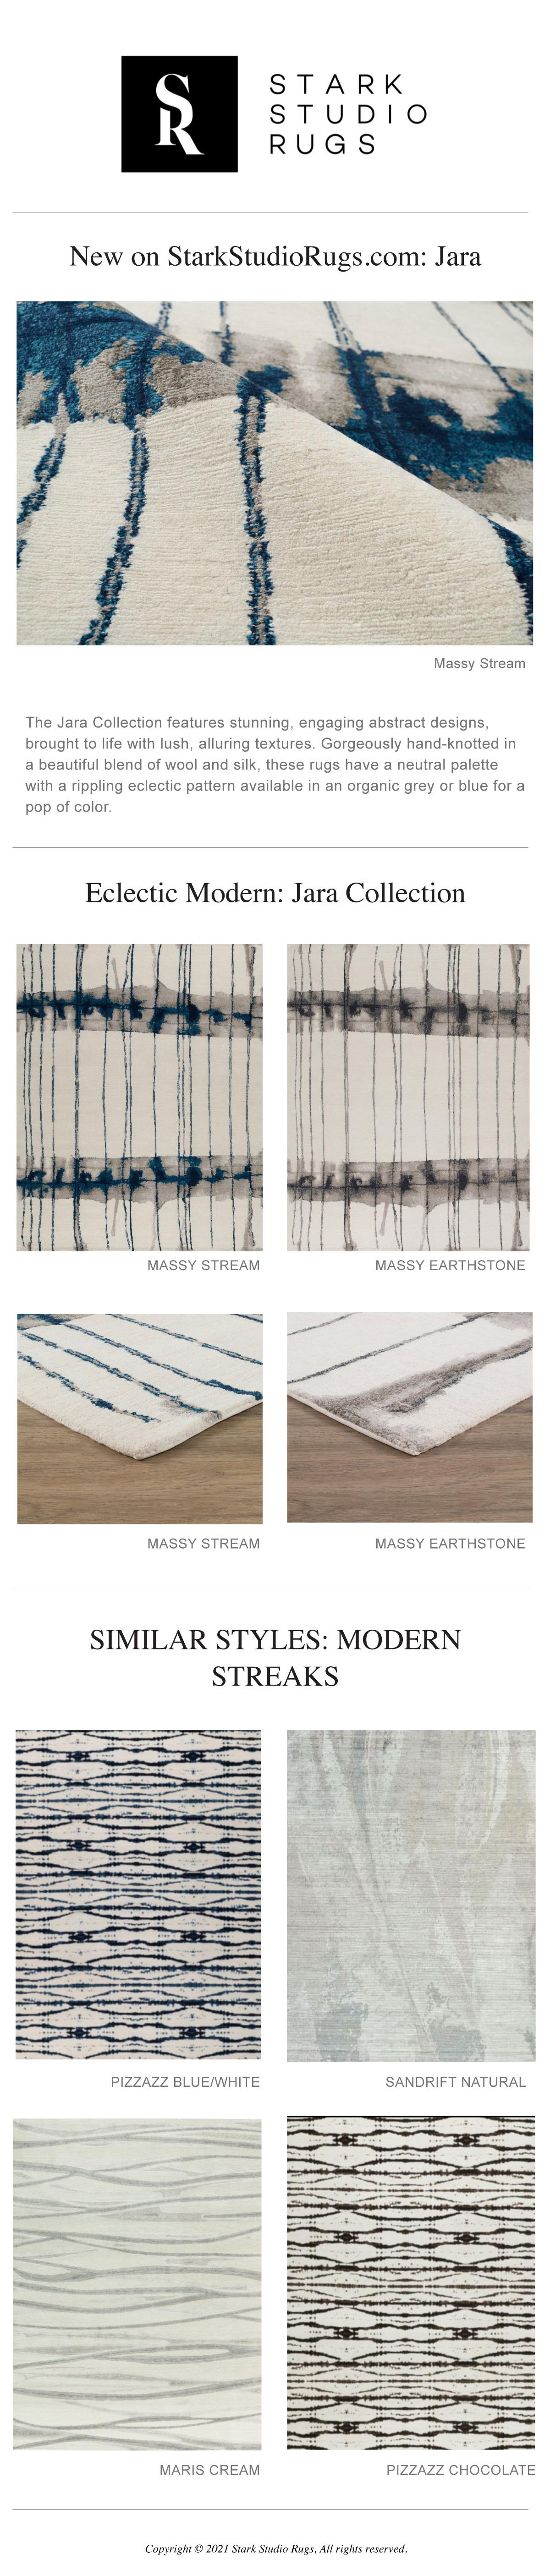 Stark Studio Rugs - New Modern Eclectics: Jara Collection